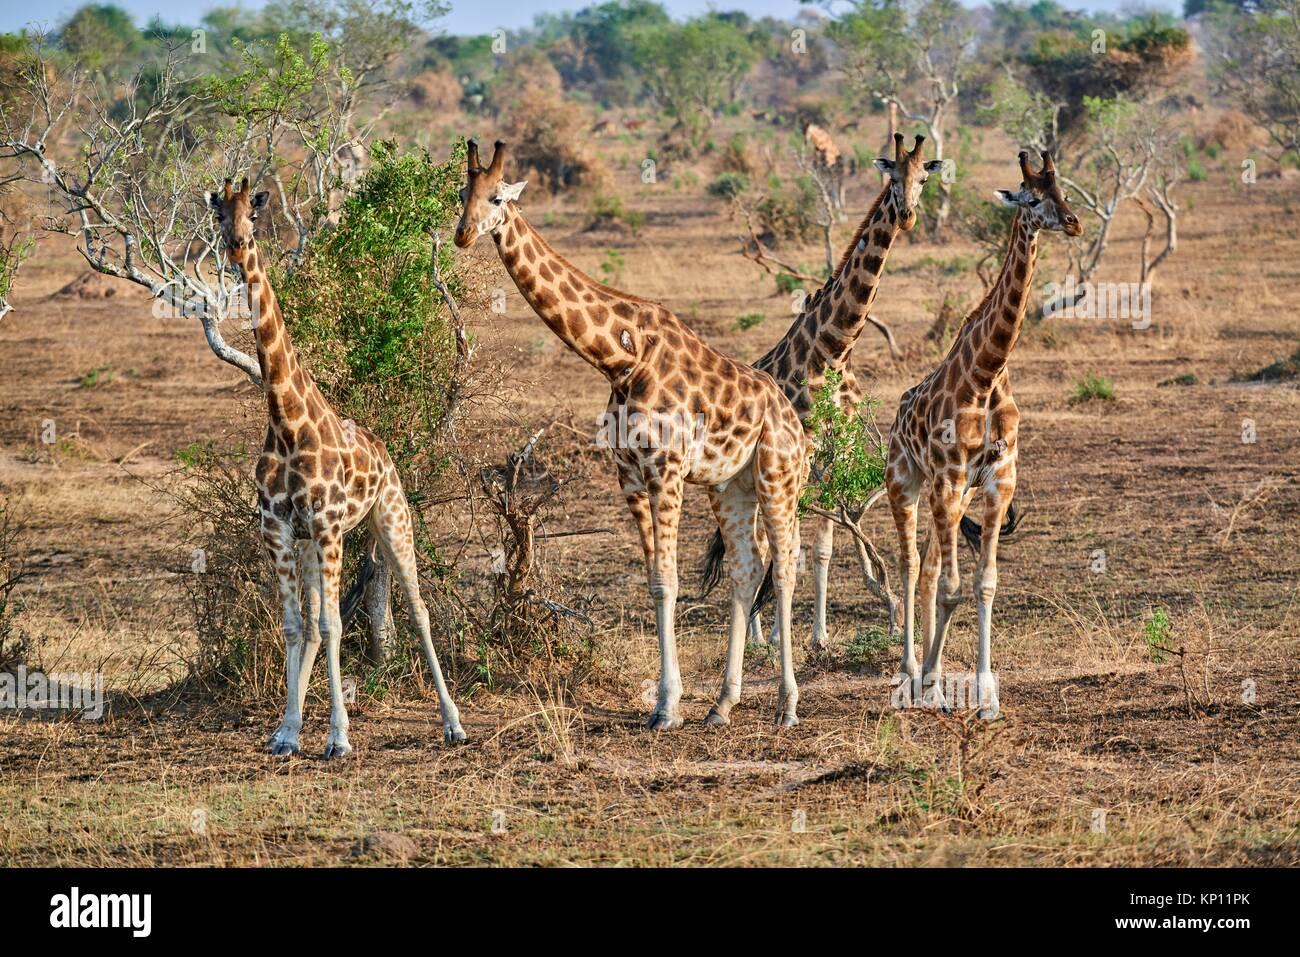 La Rothschild giraffe (Giraffa camelopardalis rothschildi) in Murchisson Falls National Park, Uganda. Immagini Stock